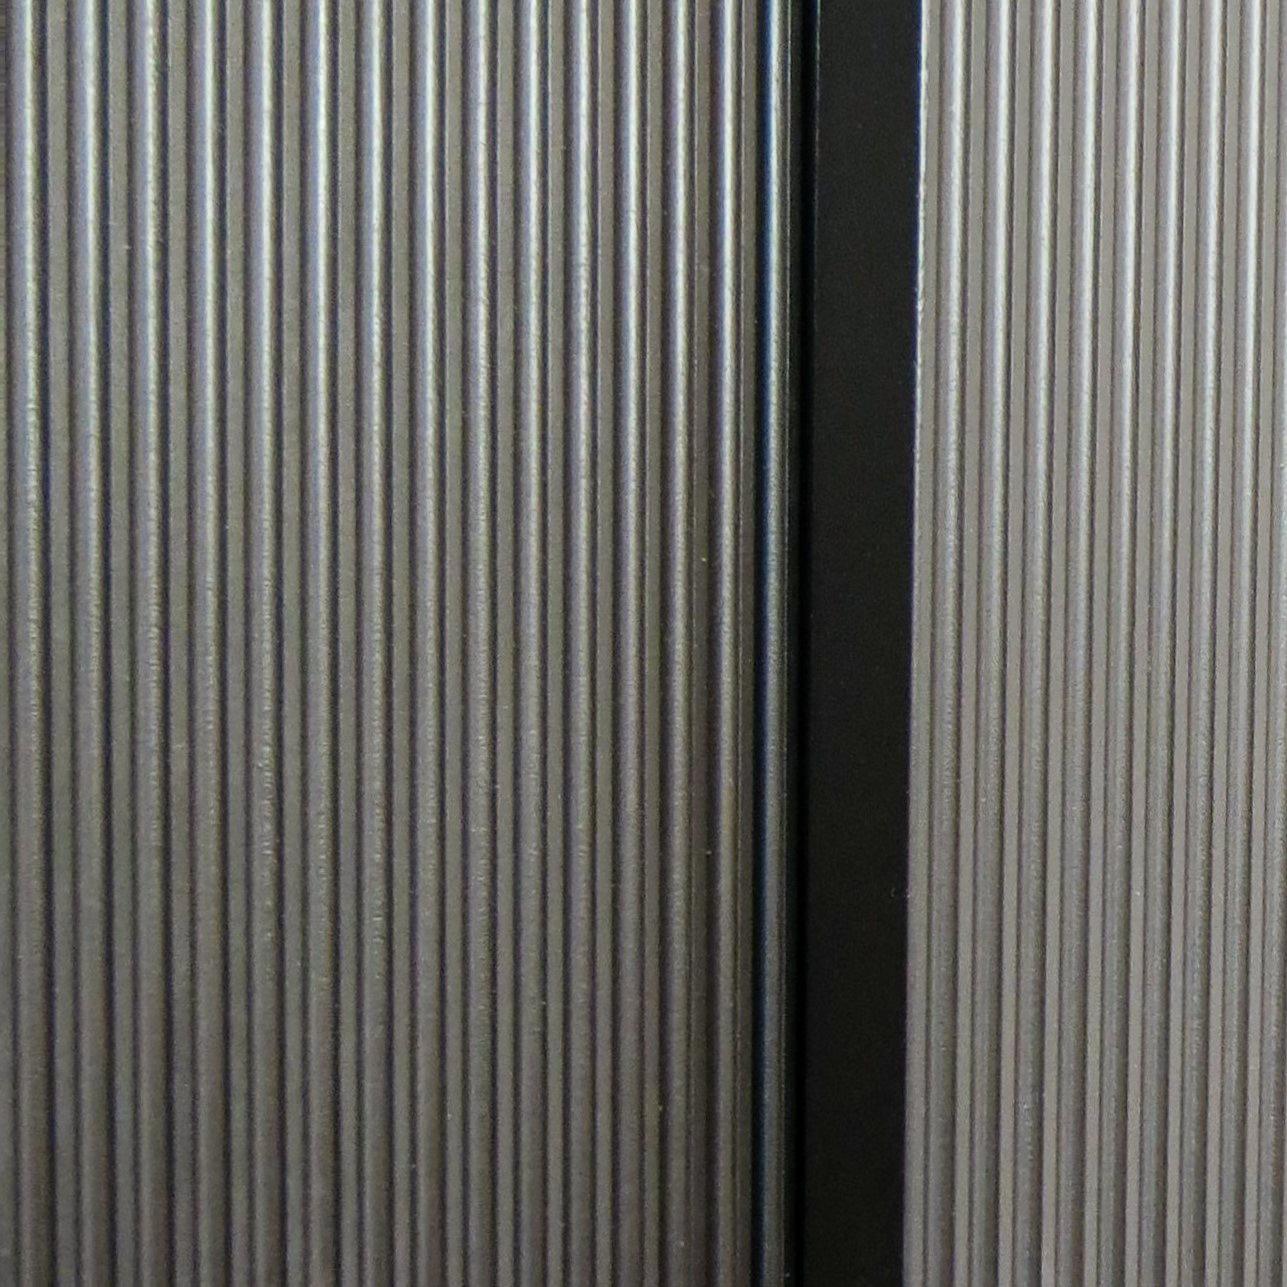 Cover-ScanWest Doors-PINSTRIPE-Zinger